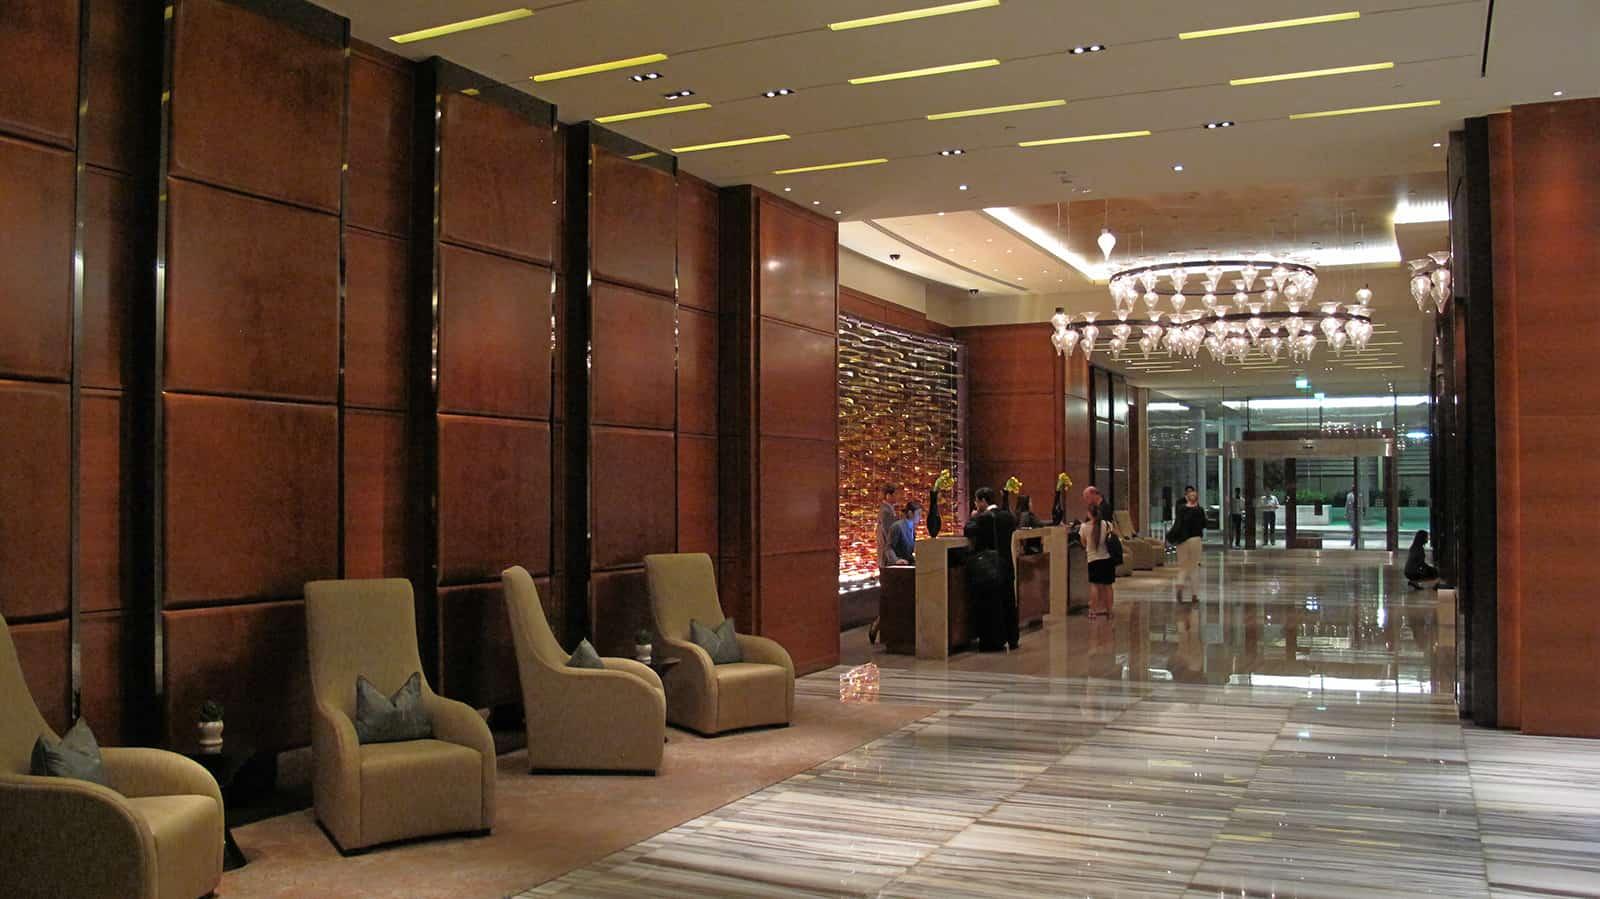 ROSEWOOD ABU DHABI – ABU DHABI, UAE